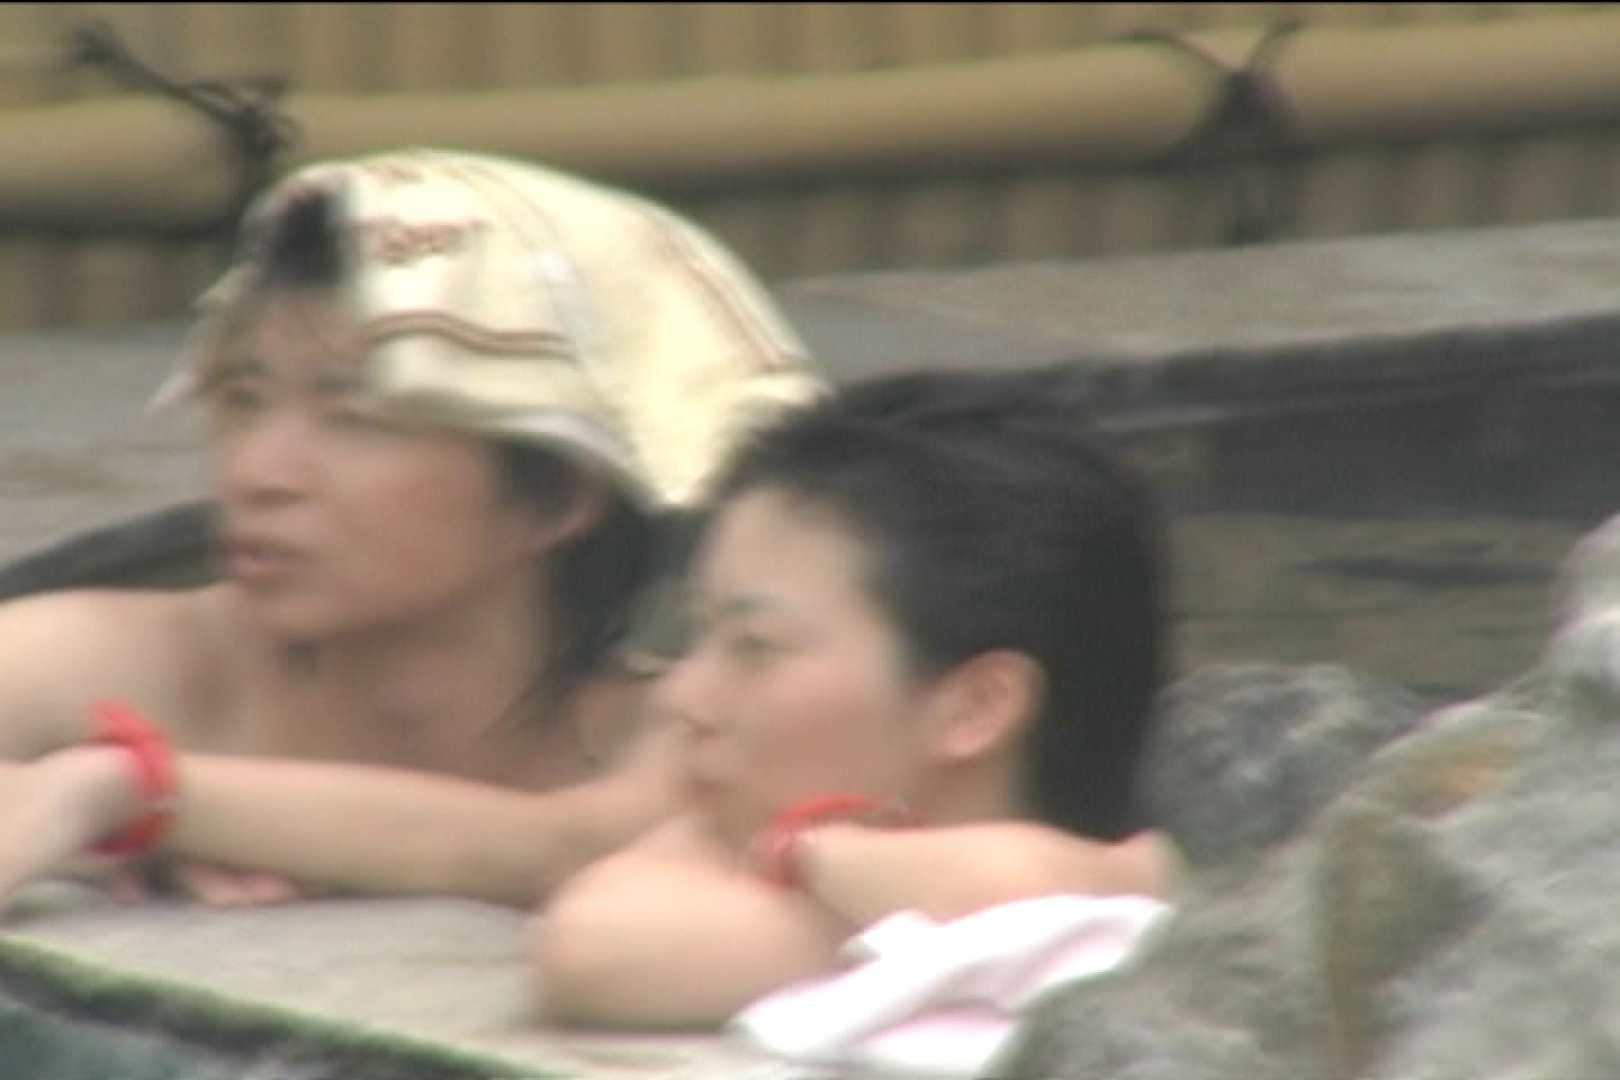 Aquaな露天風呂Vol.122 HなOL   0  107pic 1